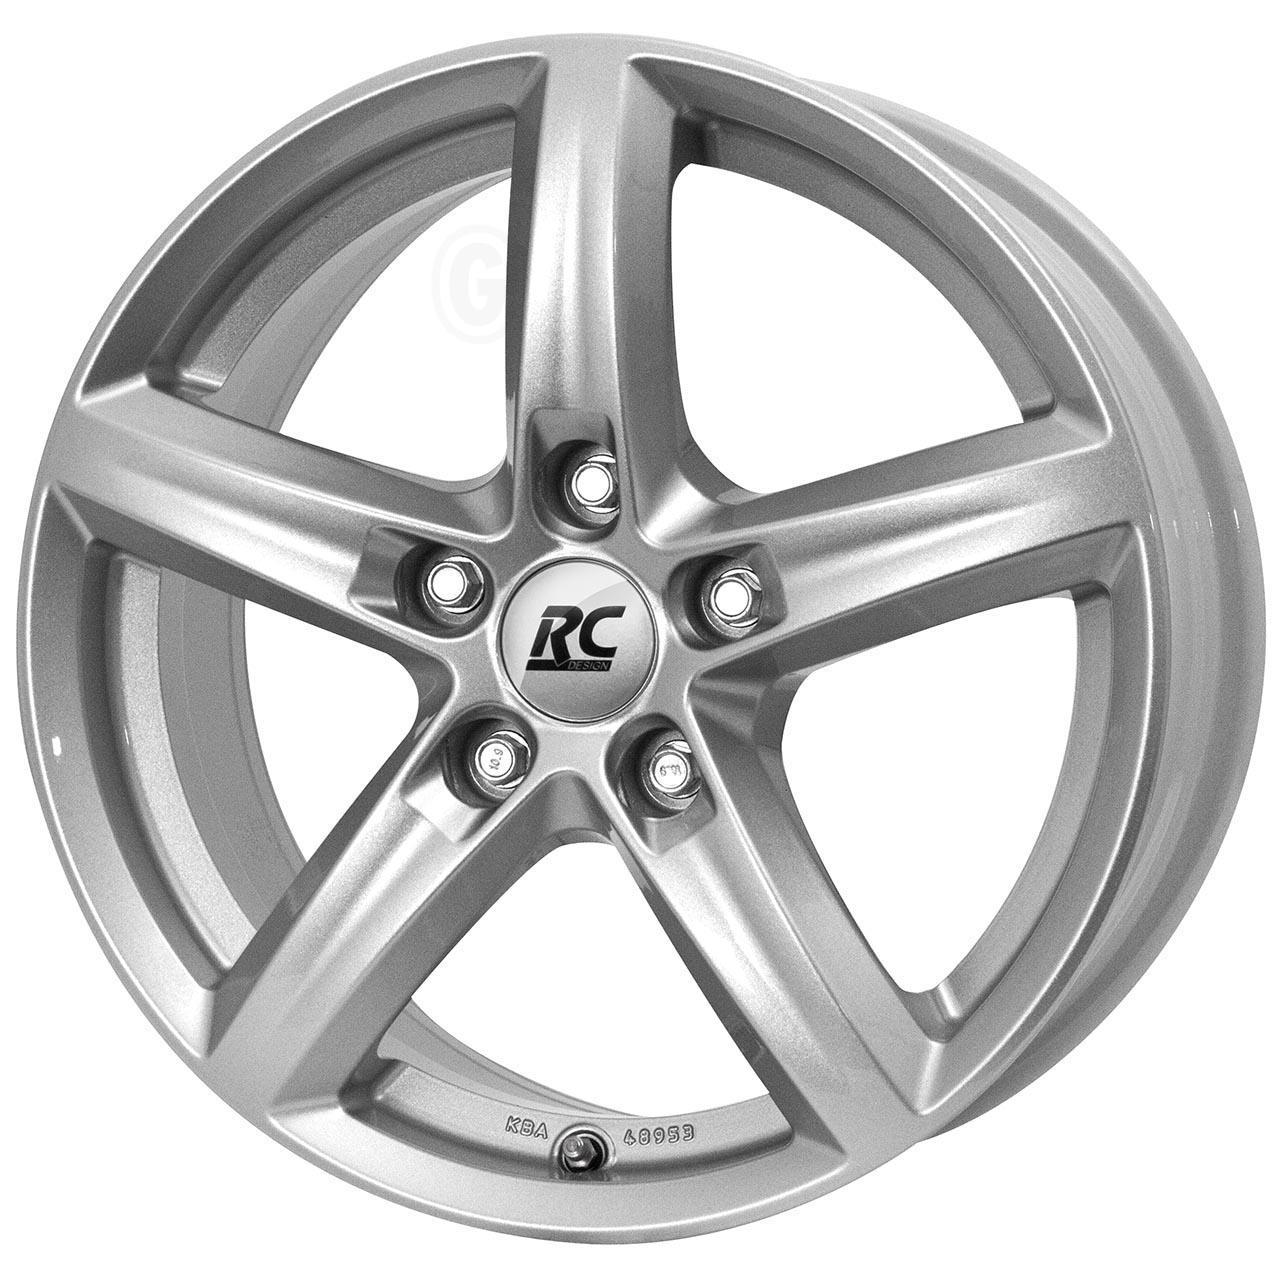 RC Design Rc24 Crystal silver 6.5x16 5x108 ET50